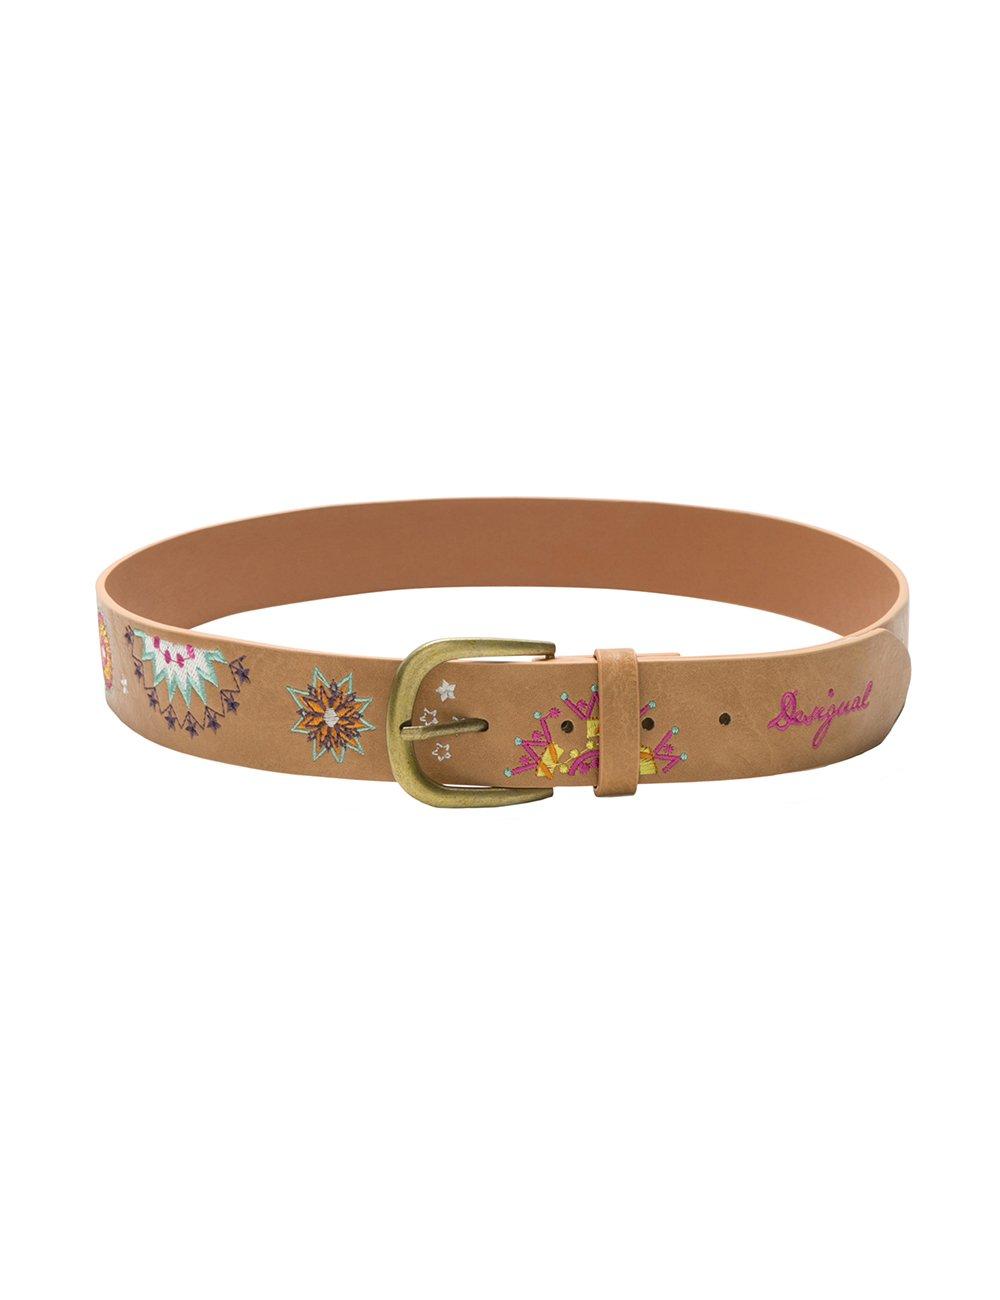 Desigual Belt_Amelie Cinturón para Mujer